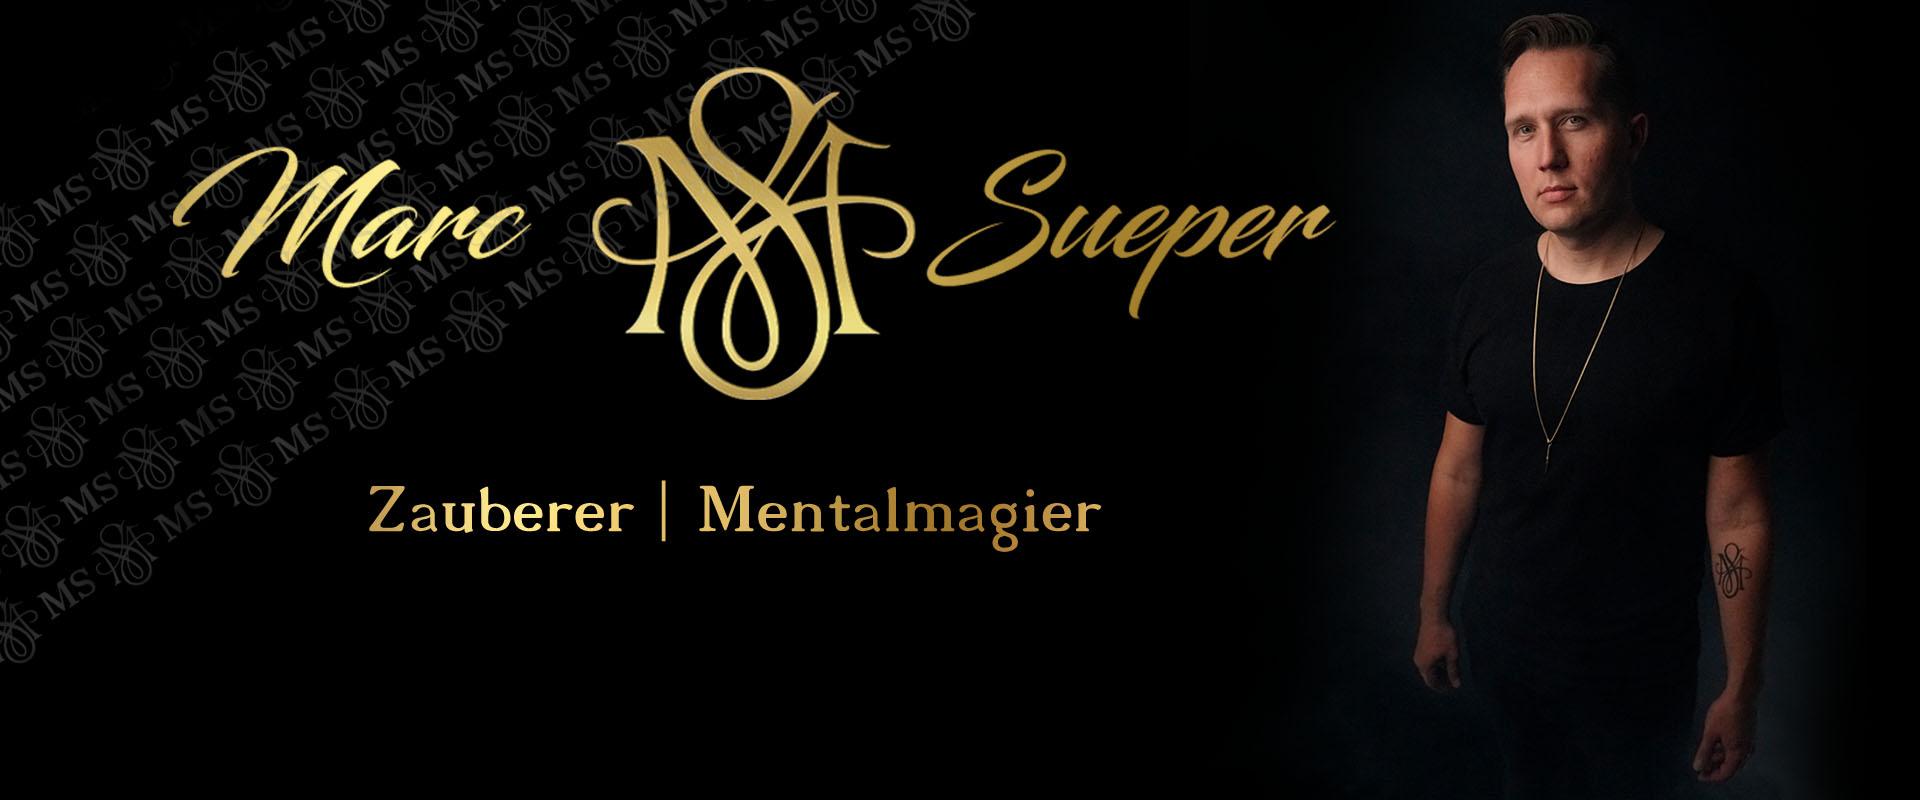 Zauberer & Mentalmagier Marc Sueper Bochum Ruhrgebiet NRW Zauberkünstler Mentalist